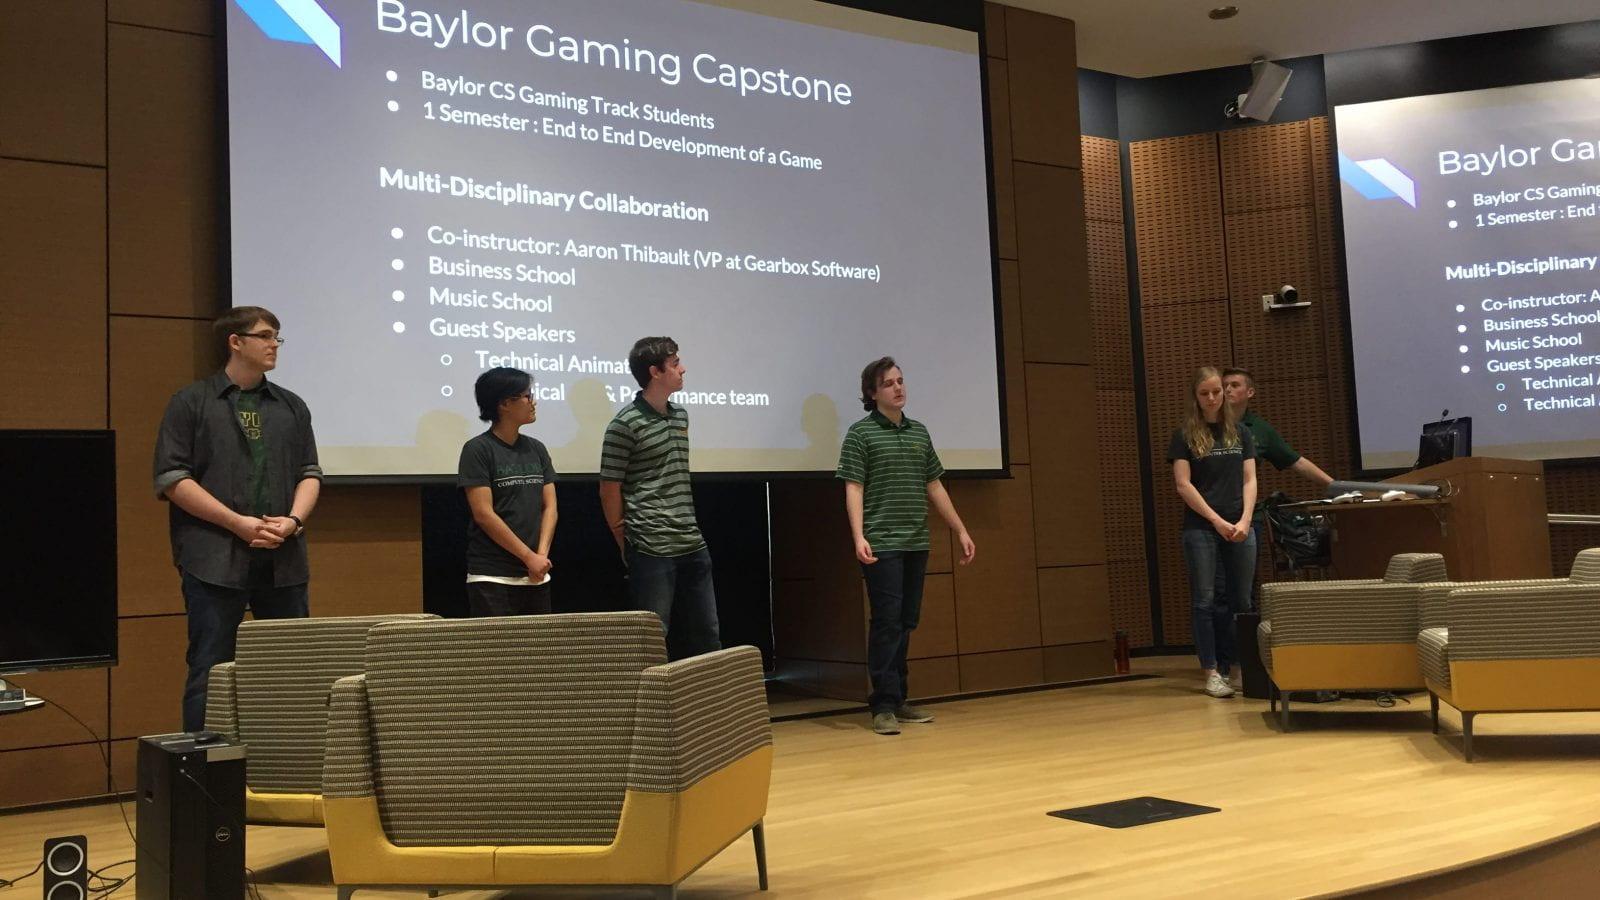 Gaming Capstone Presentation 2018